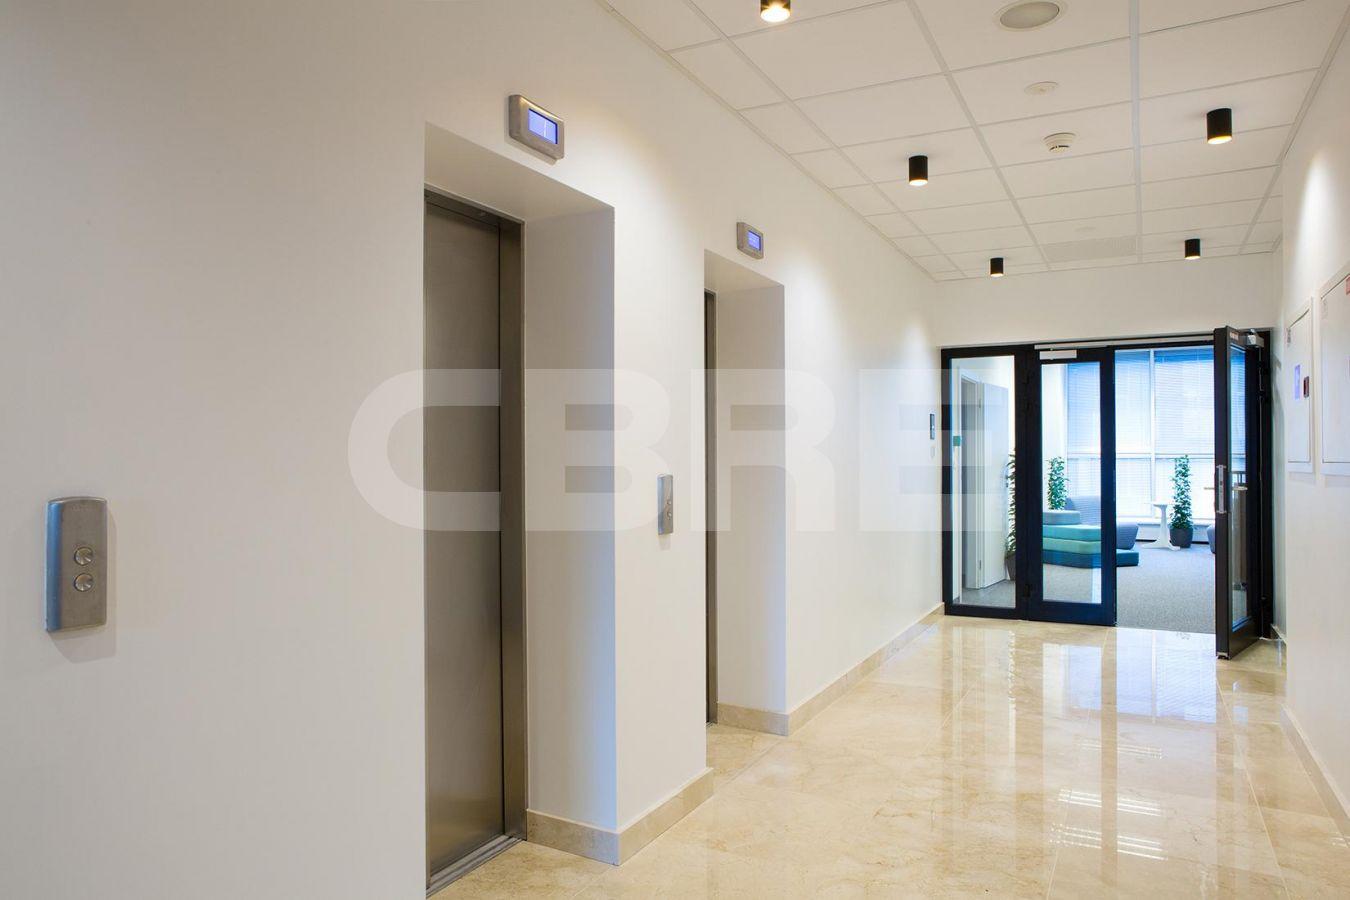 Pressburg Tower, Bratislava - Ružinov | Offices for rent by CBRE | 5